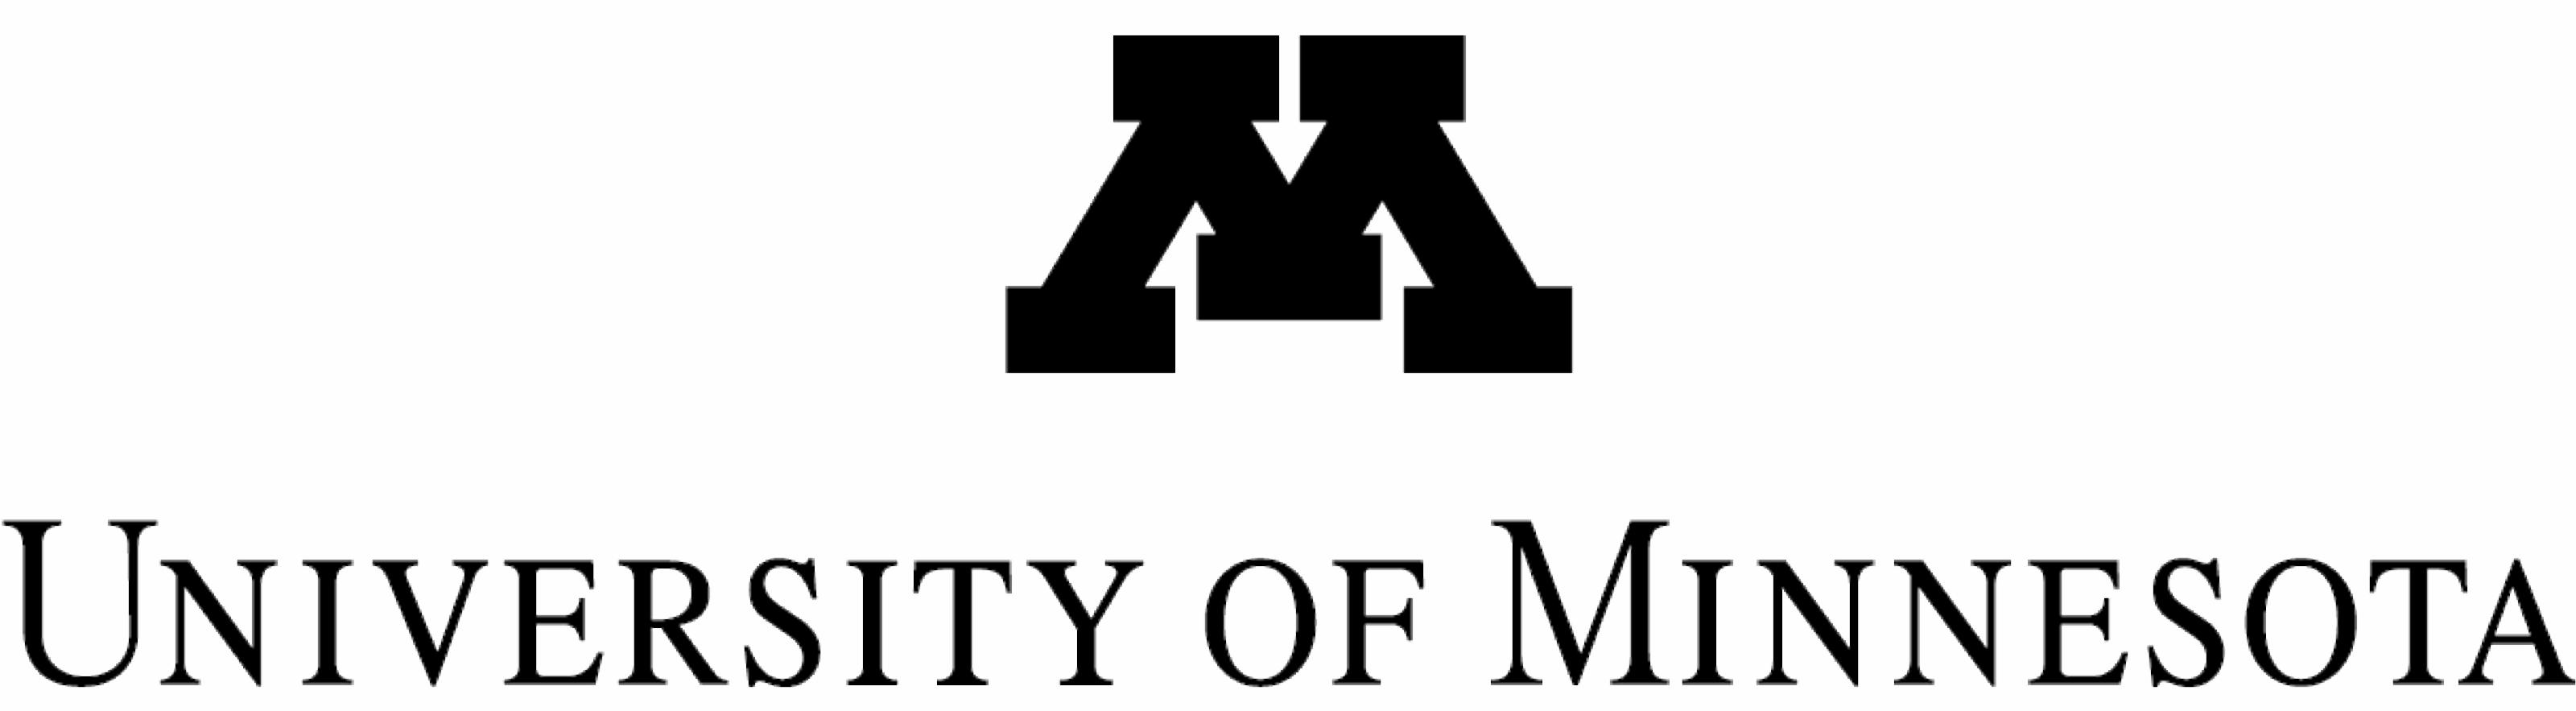 University of minnesota dating site